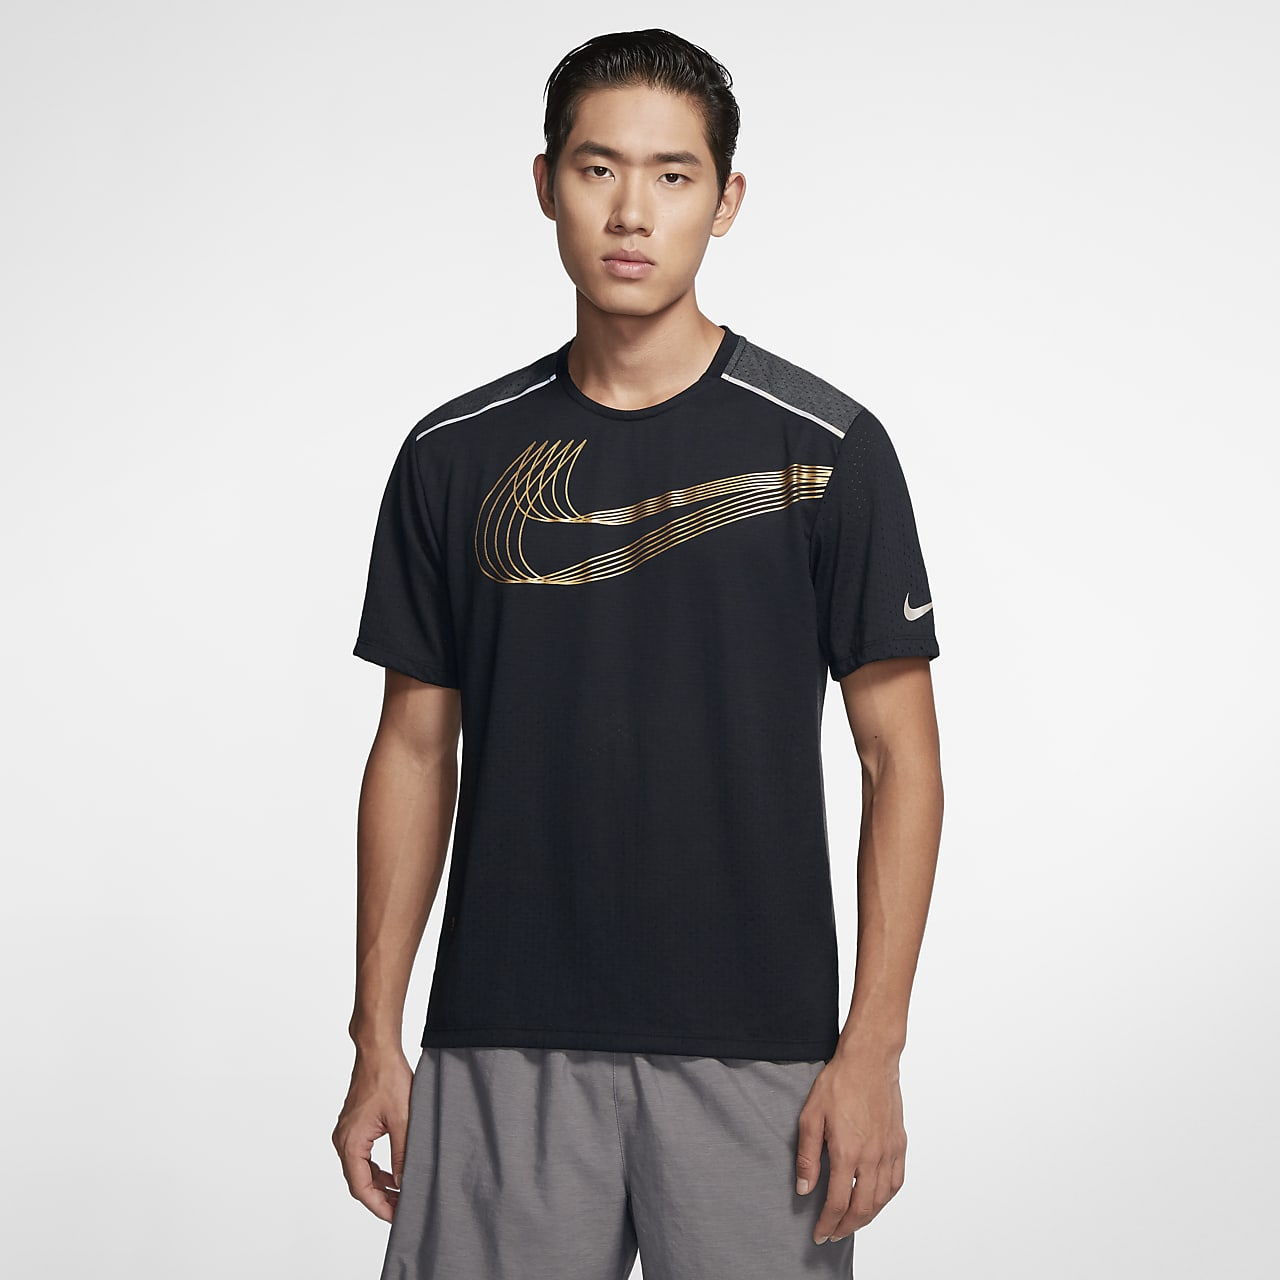 Nike Breathe Rise 365 SHM 男子跑步上衣